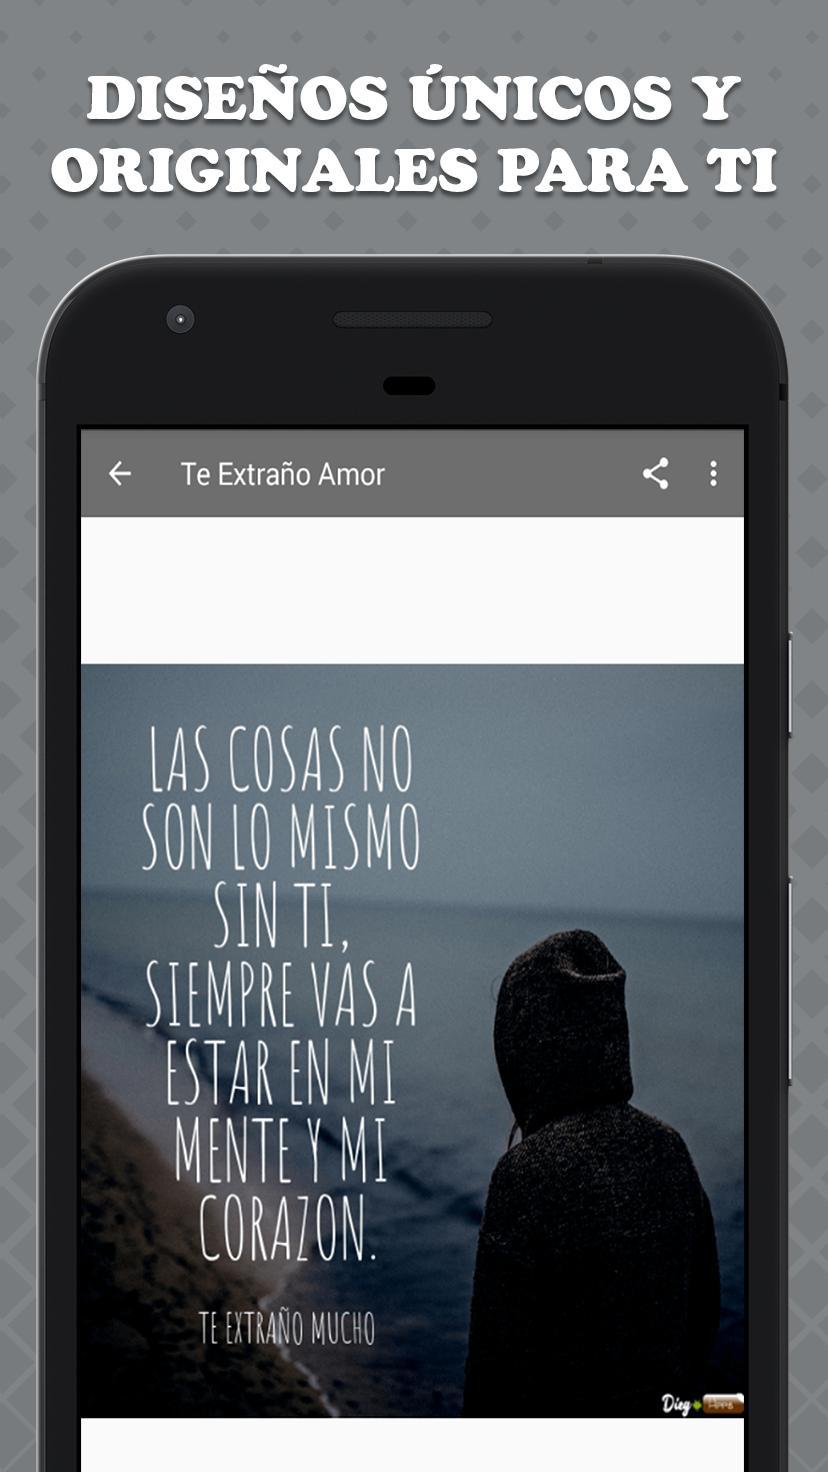 Frases De Te Extraño Mucho для андроид скачать Apk